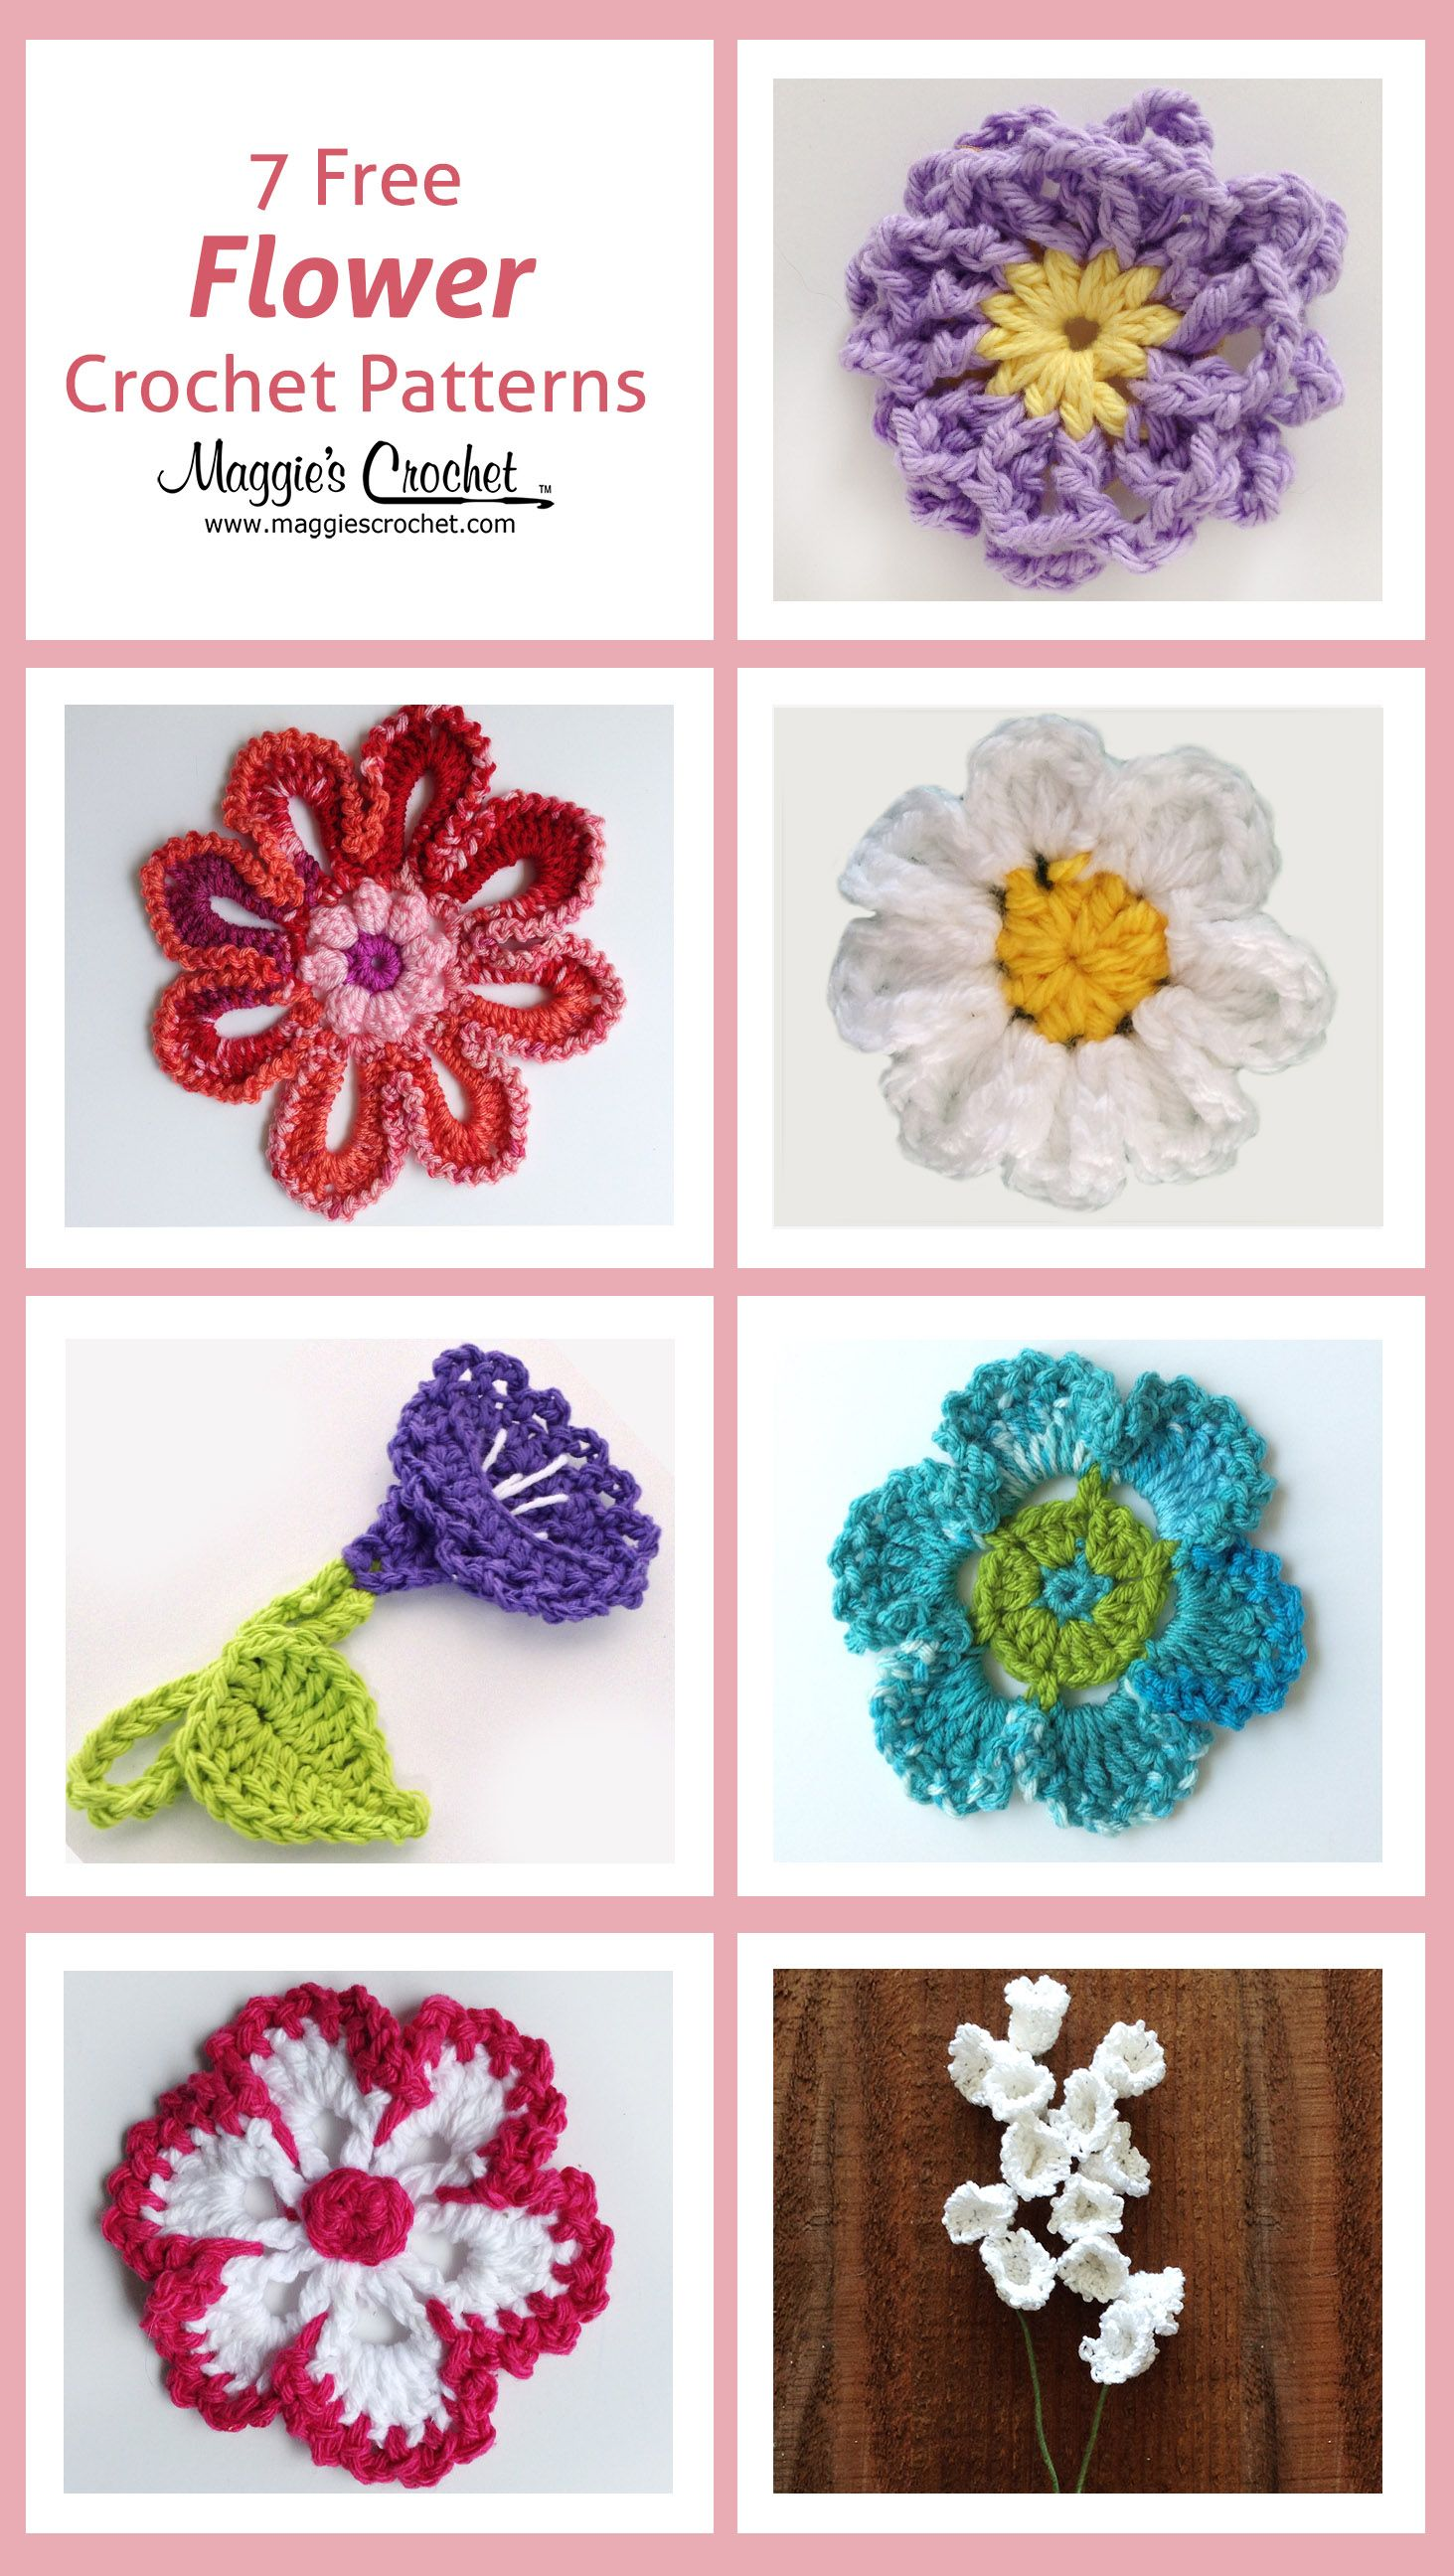 7 Free Flower Crochet Patterns from Maggie\'s Crochet | Käsityöt ...